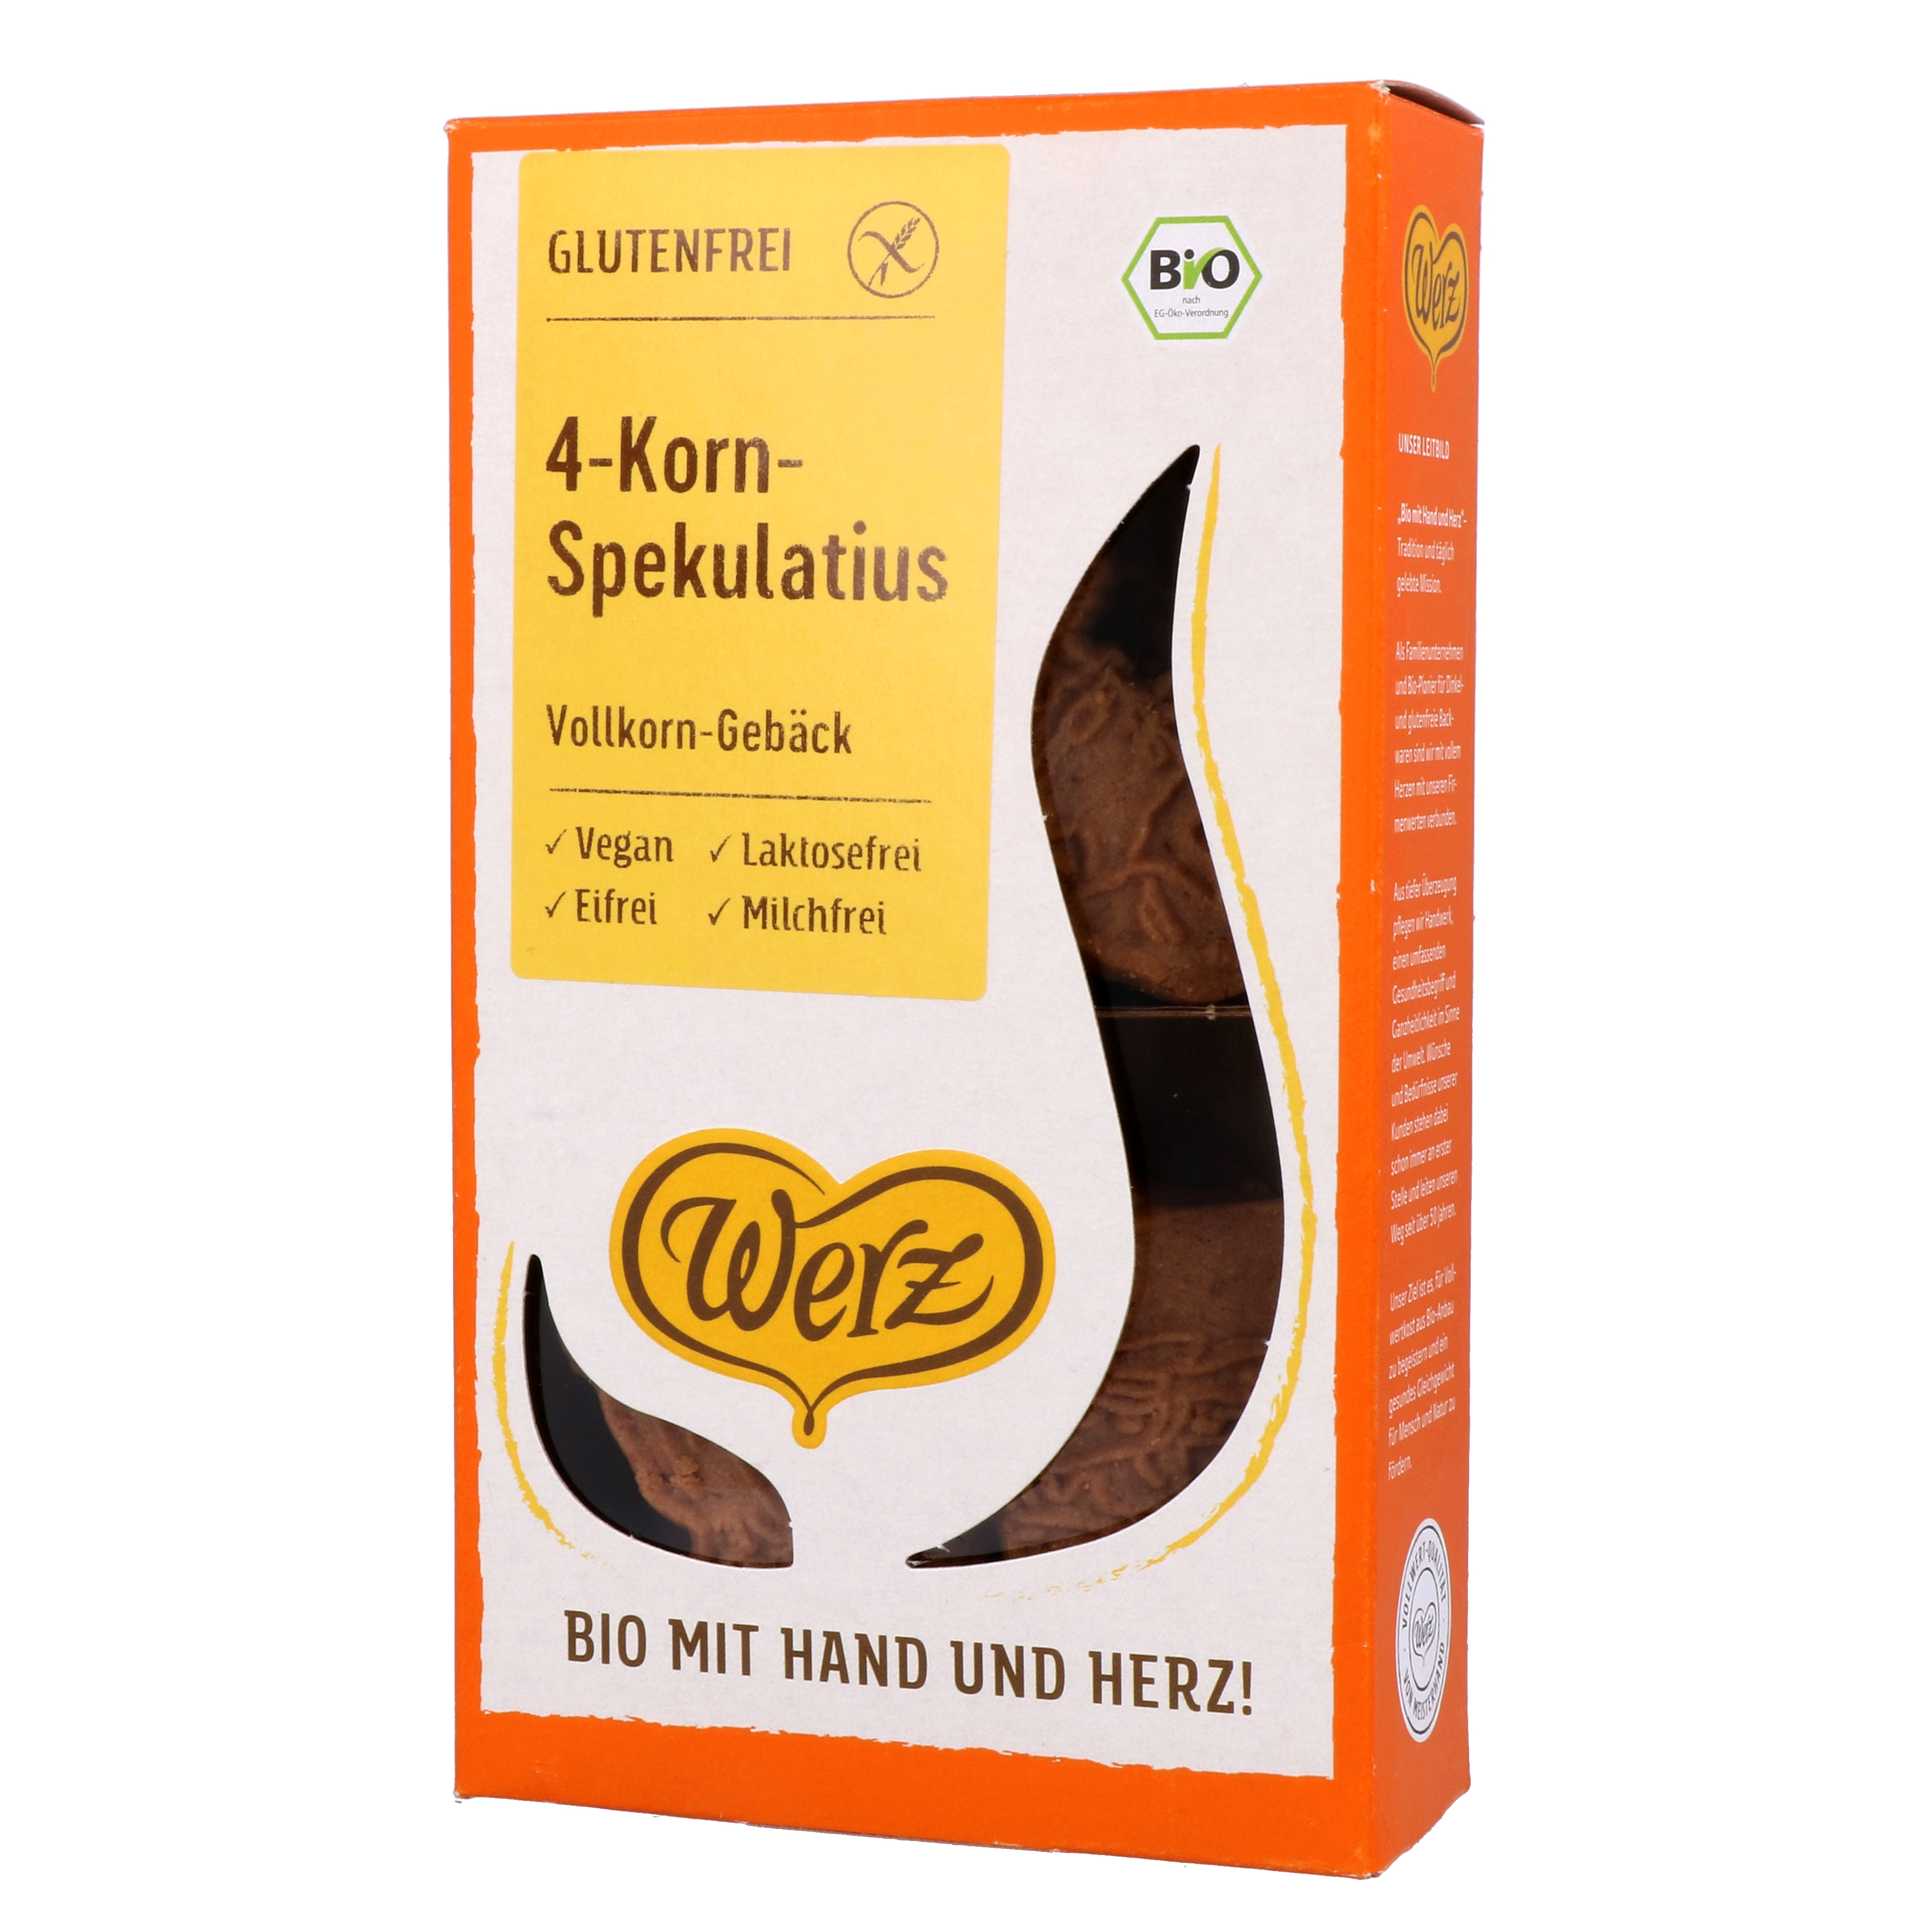 Werz Bio 4-Korn Spekulatius 125g